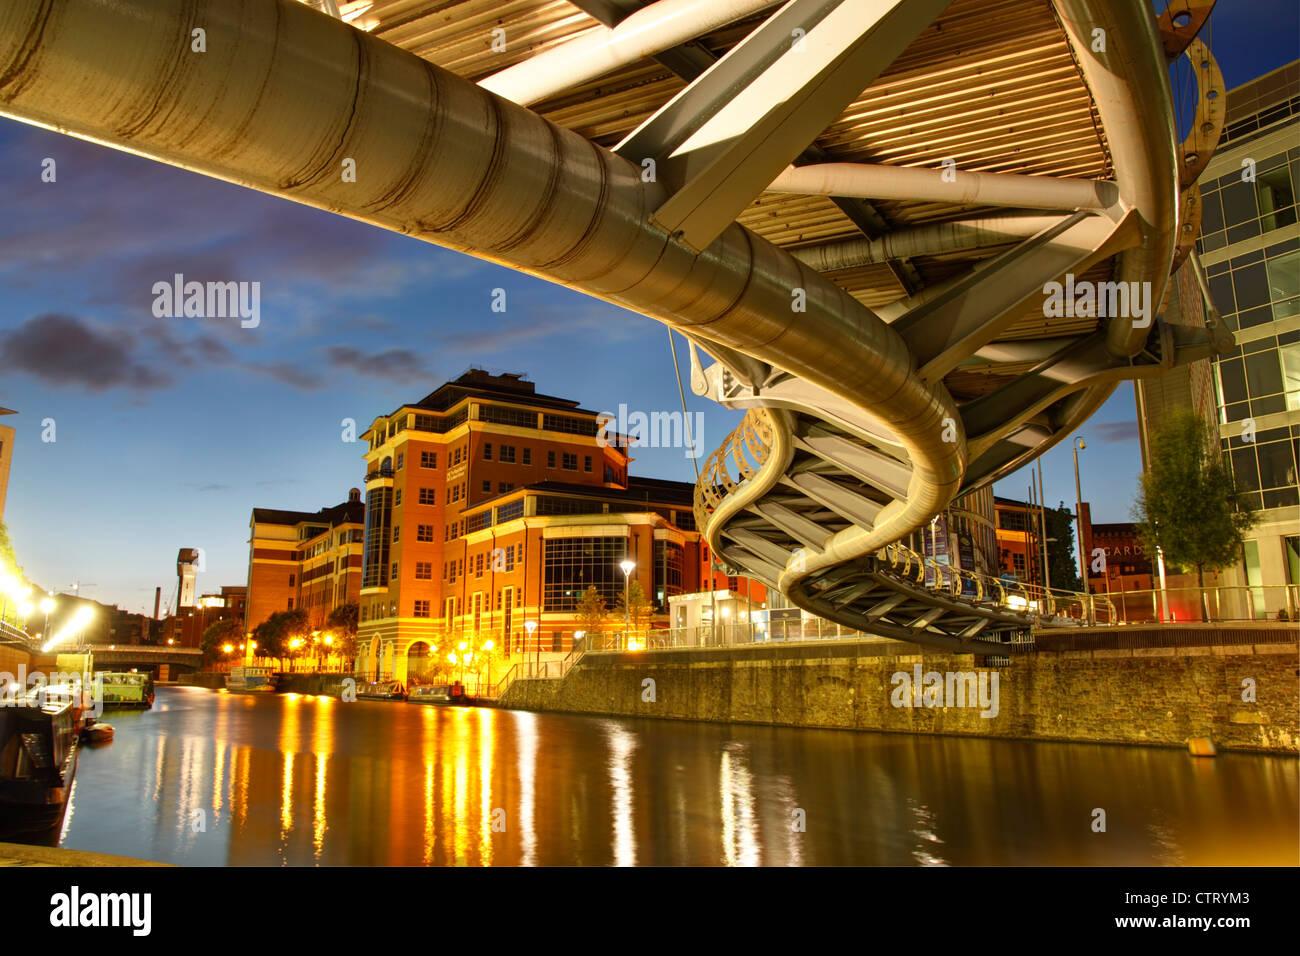 Valentine's Bridge, Temple Quay at dusk. Bristol, July 2012. - Stock Image